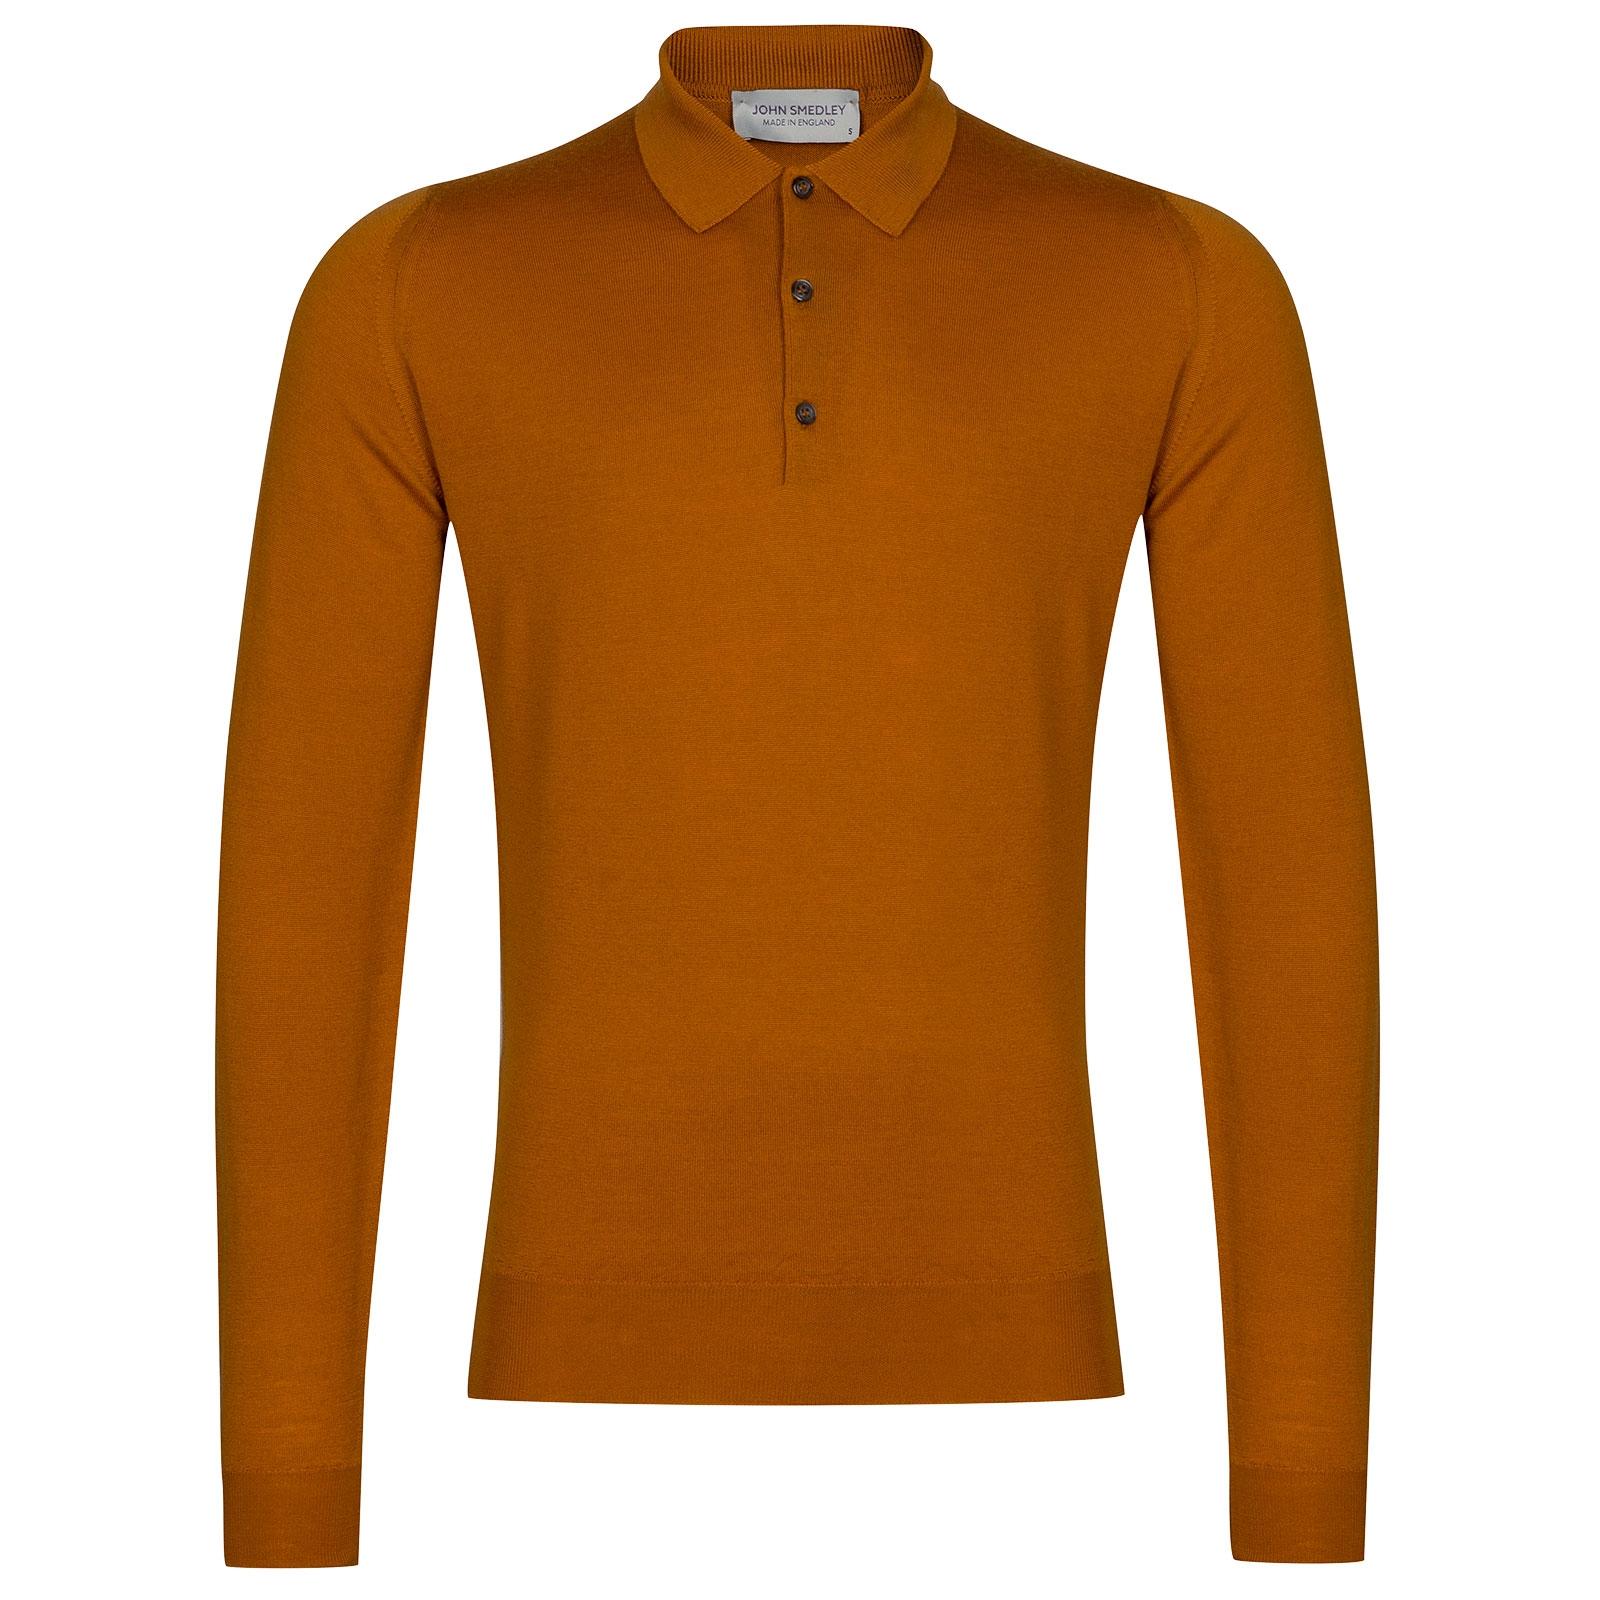 John Smedley Belper Merino Wool Shirt in Bronze-XL